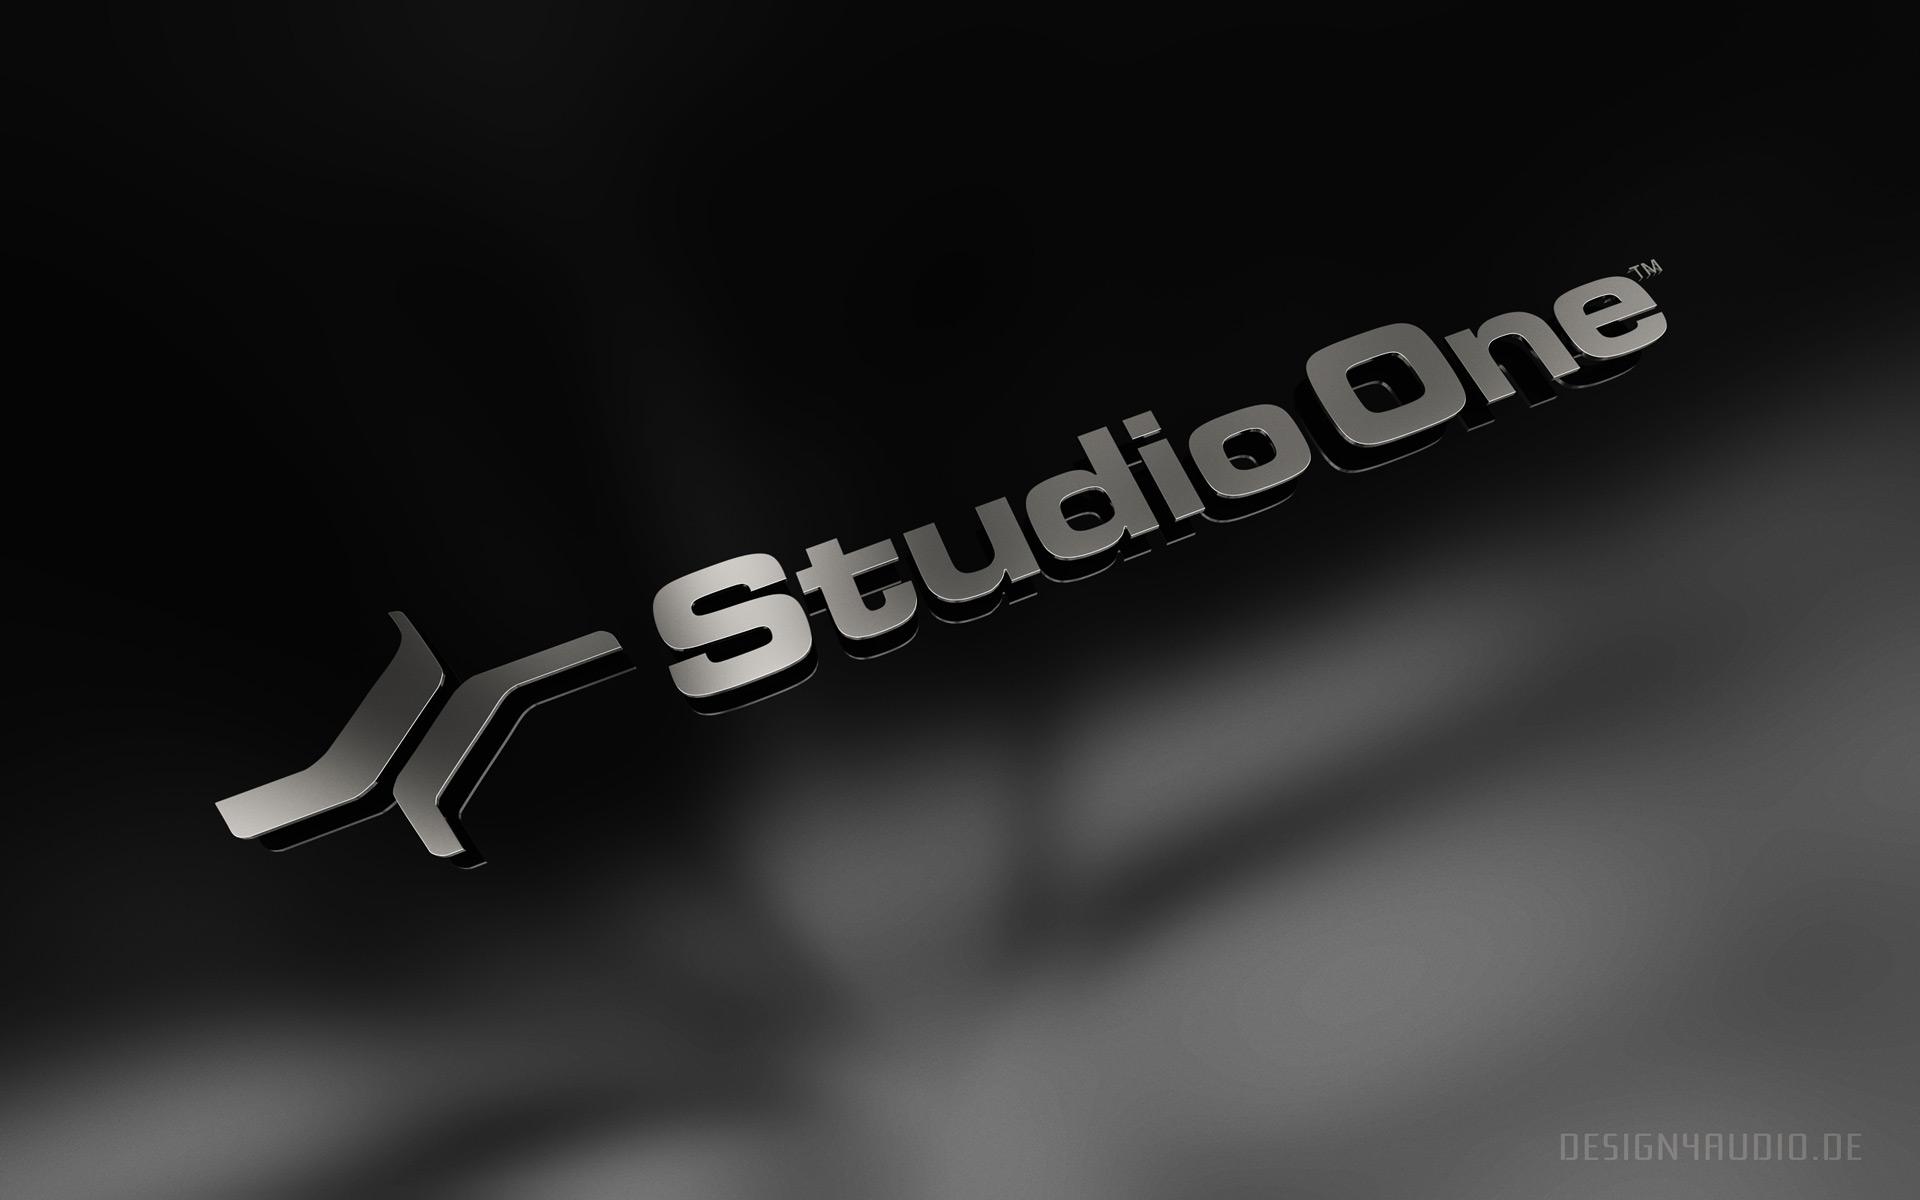 Studio Wallpapers Backgrounds - WallpaperSafari